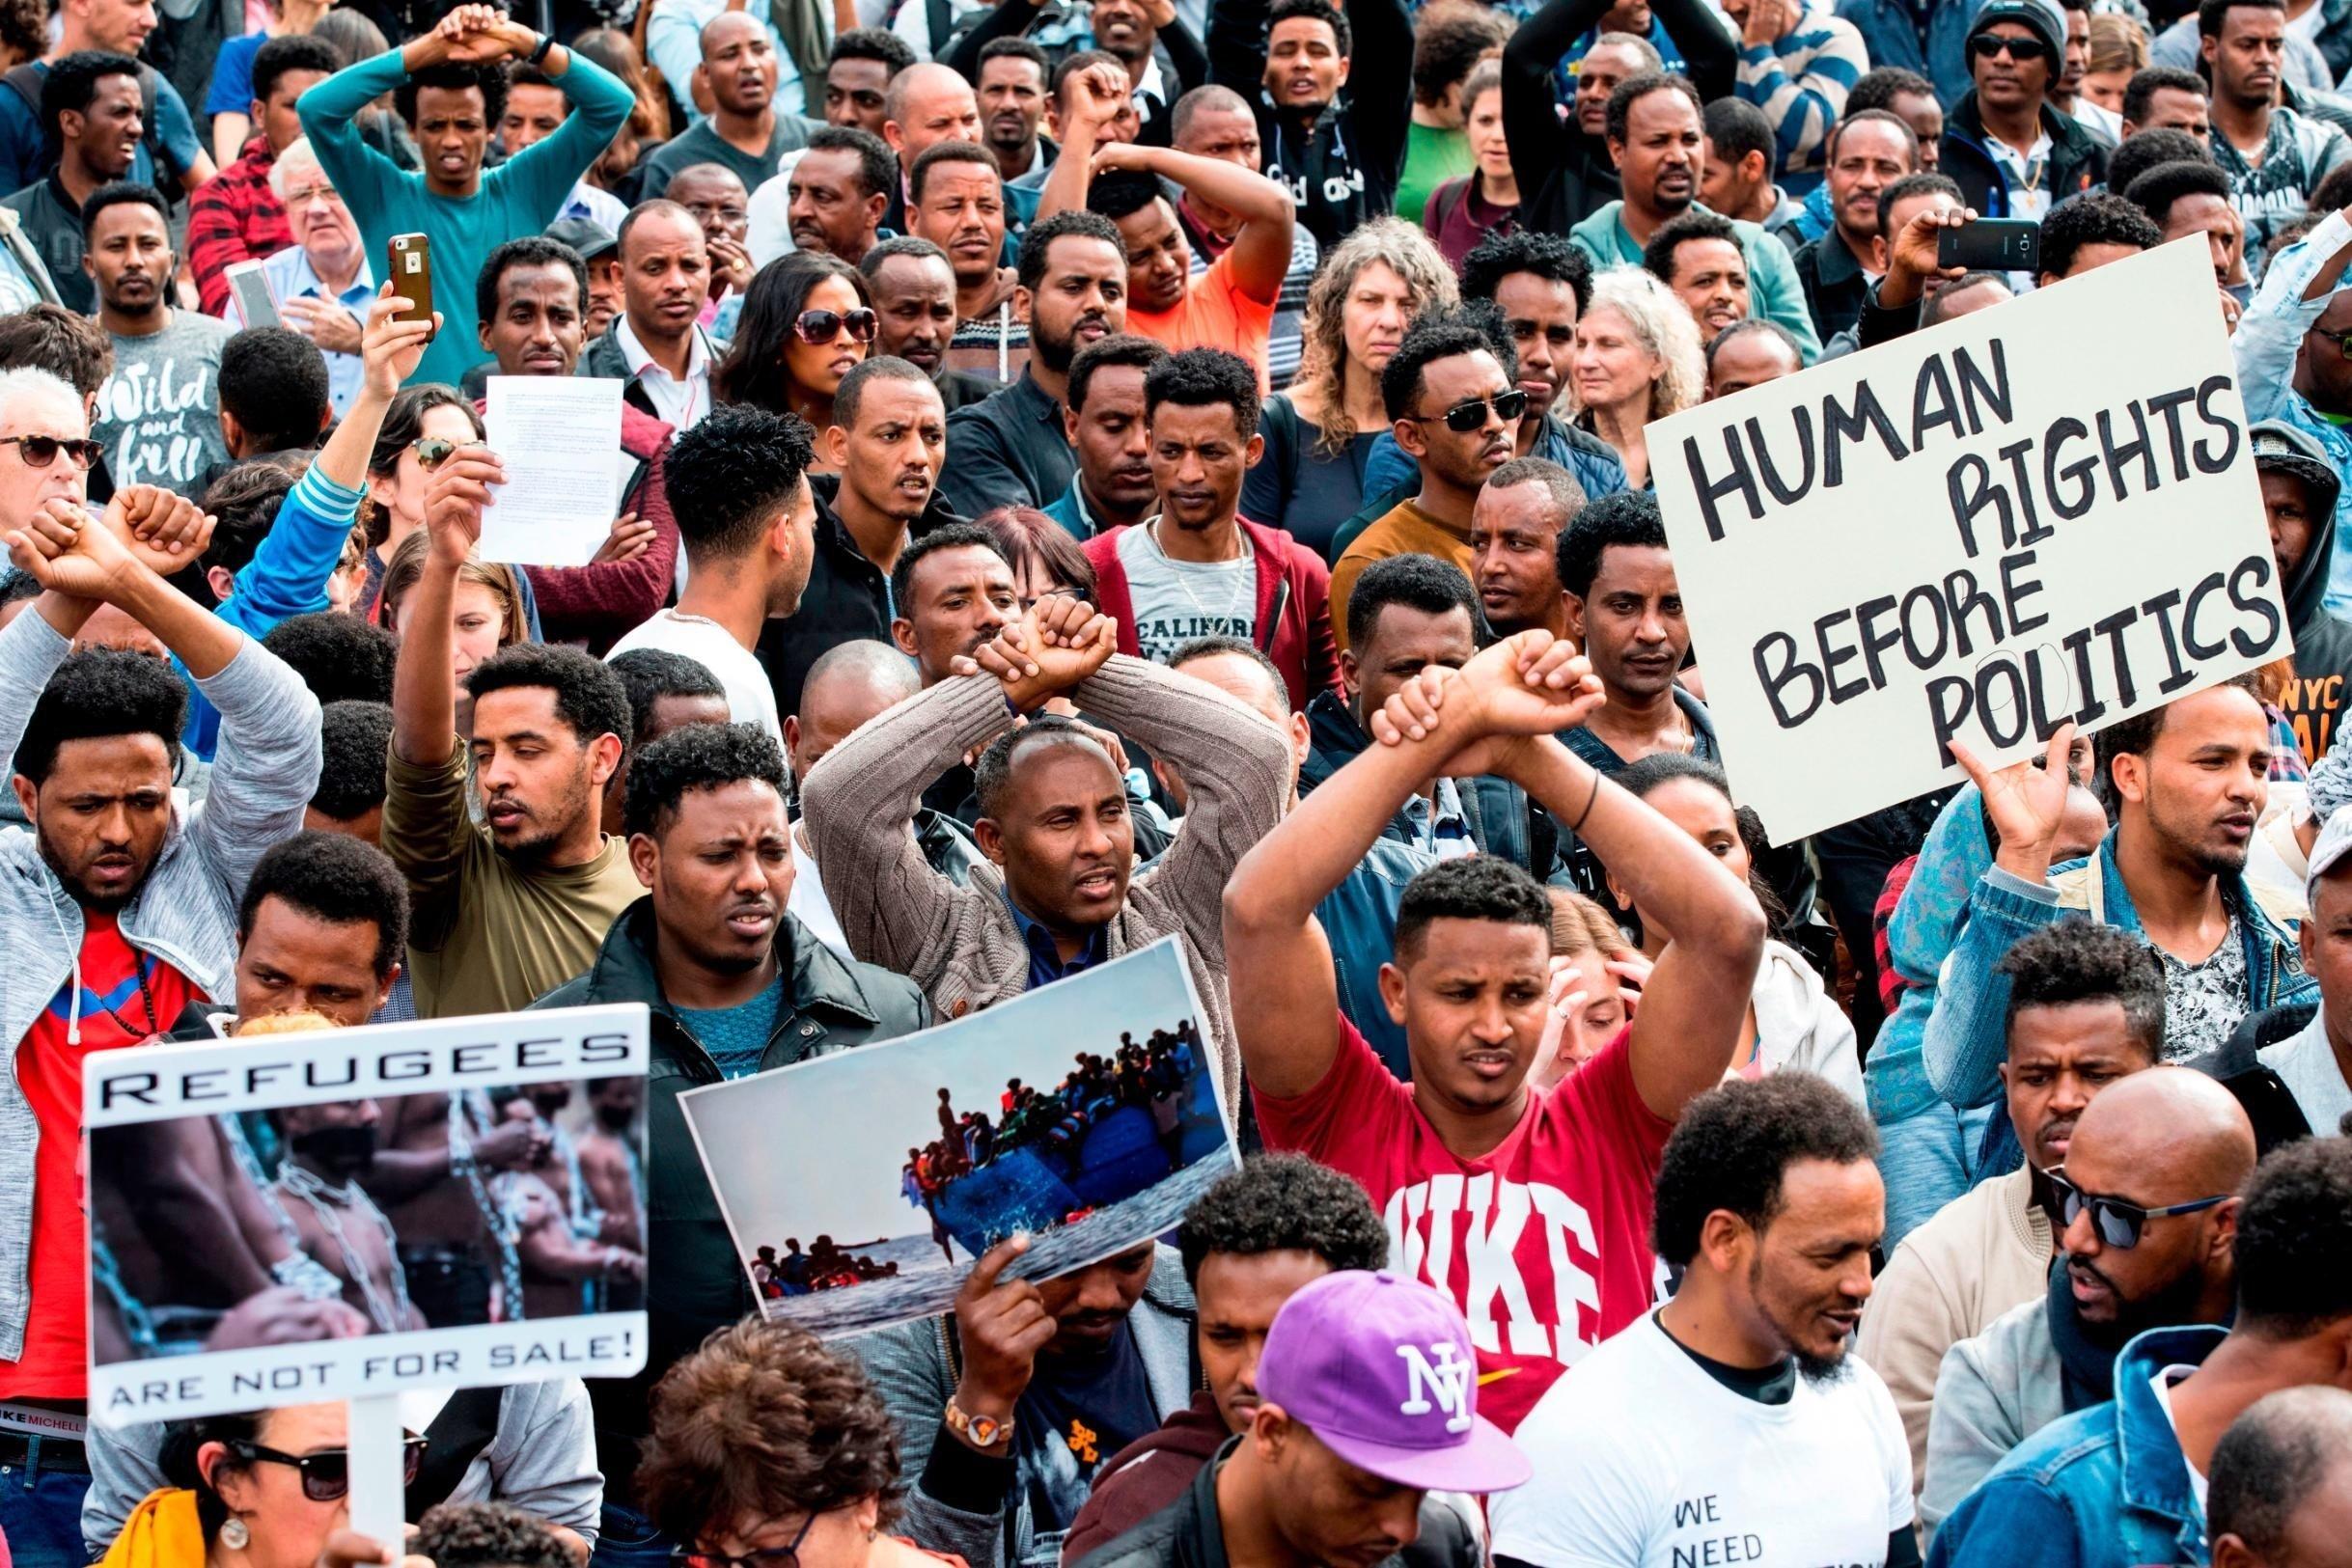 Israel deal for African migrants suspended: Netanyahu